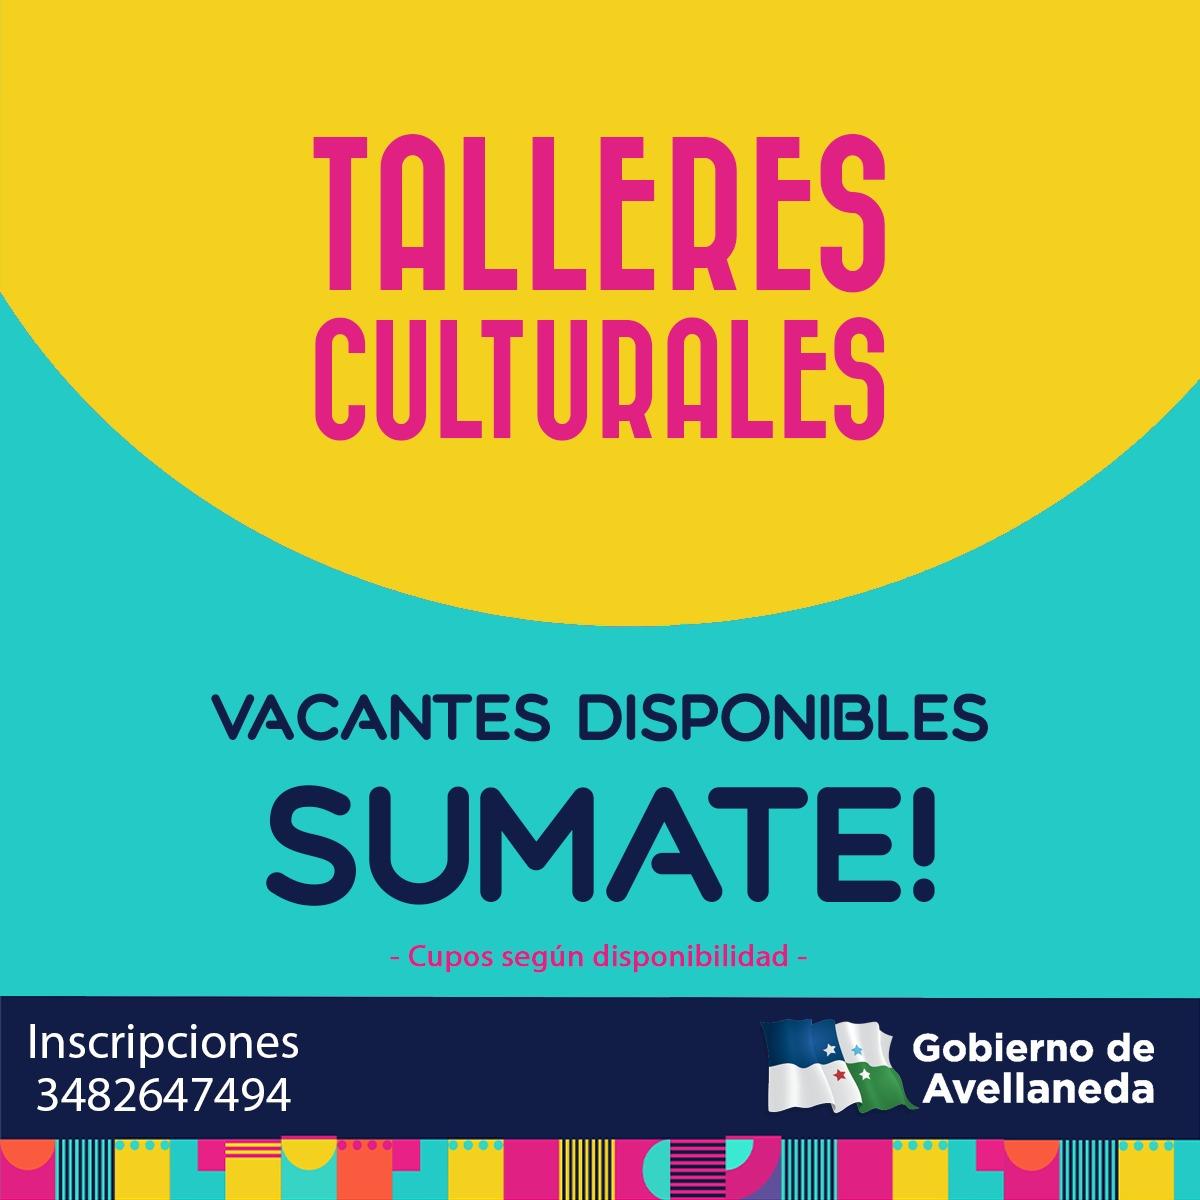 Talleres Culturales en Avellaneda: cupos vacantes